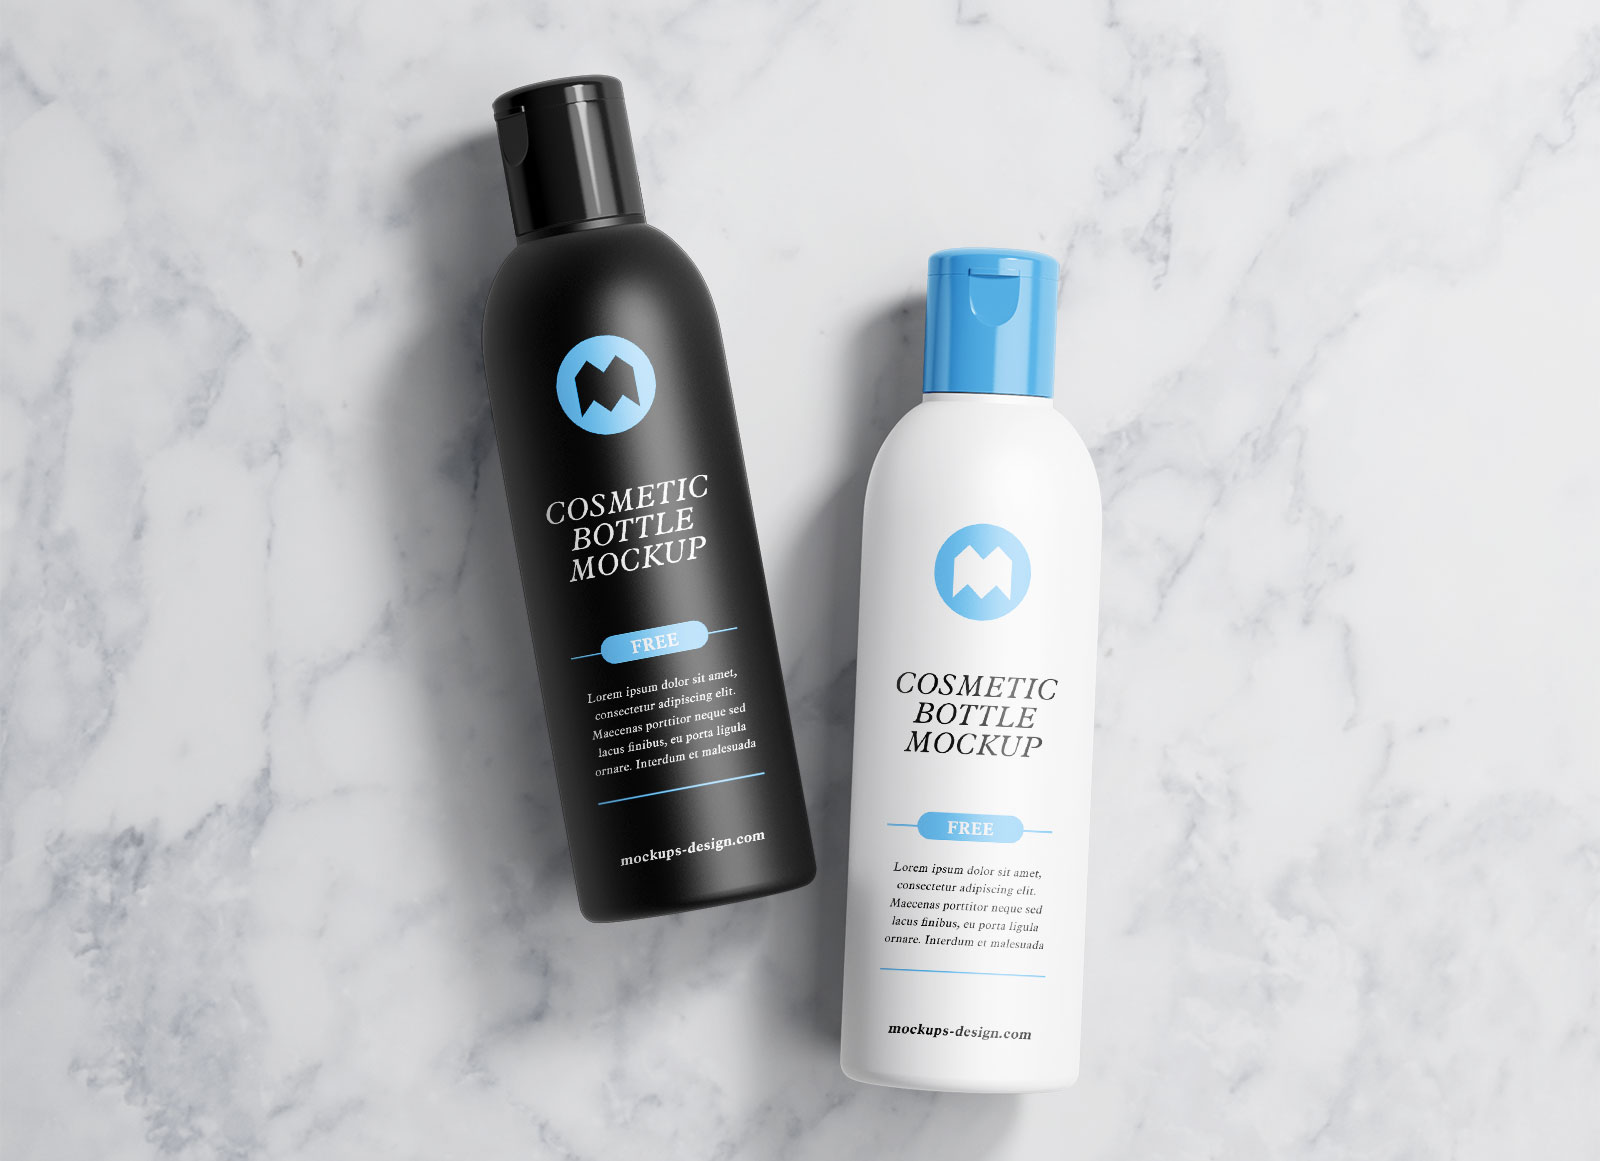 Free-Cosmetic_Cream-Oil-Bottle_Mockup_PSD-Set-3